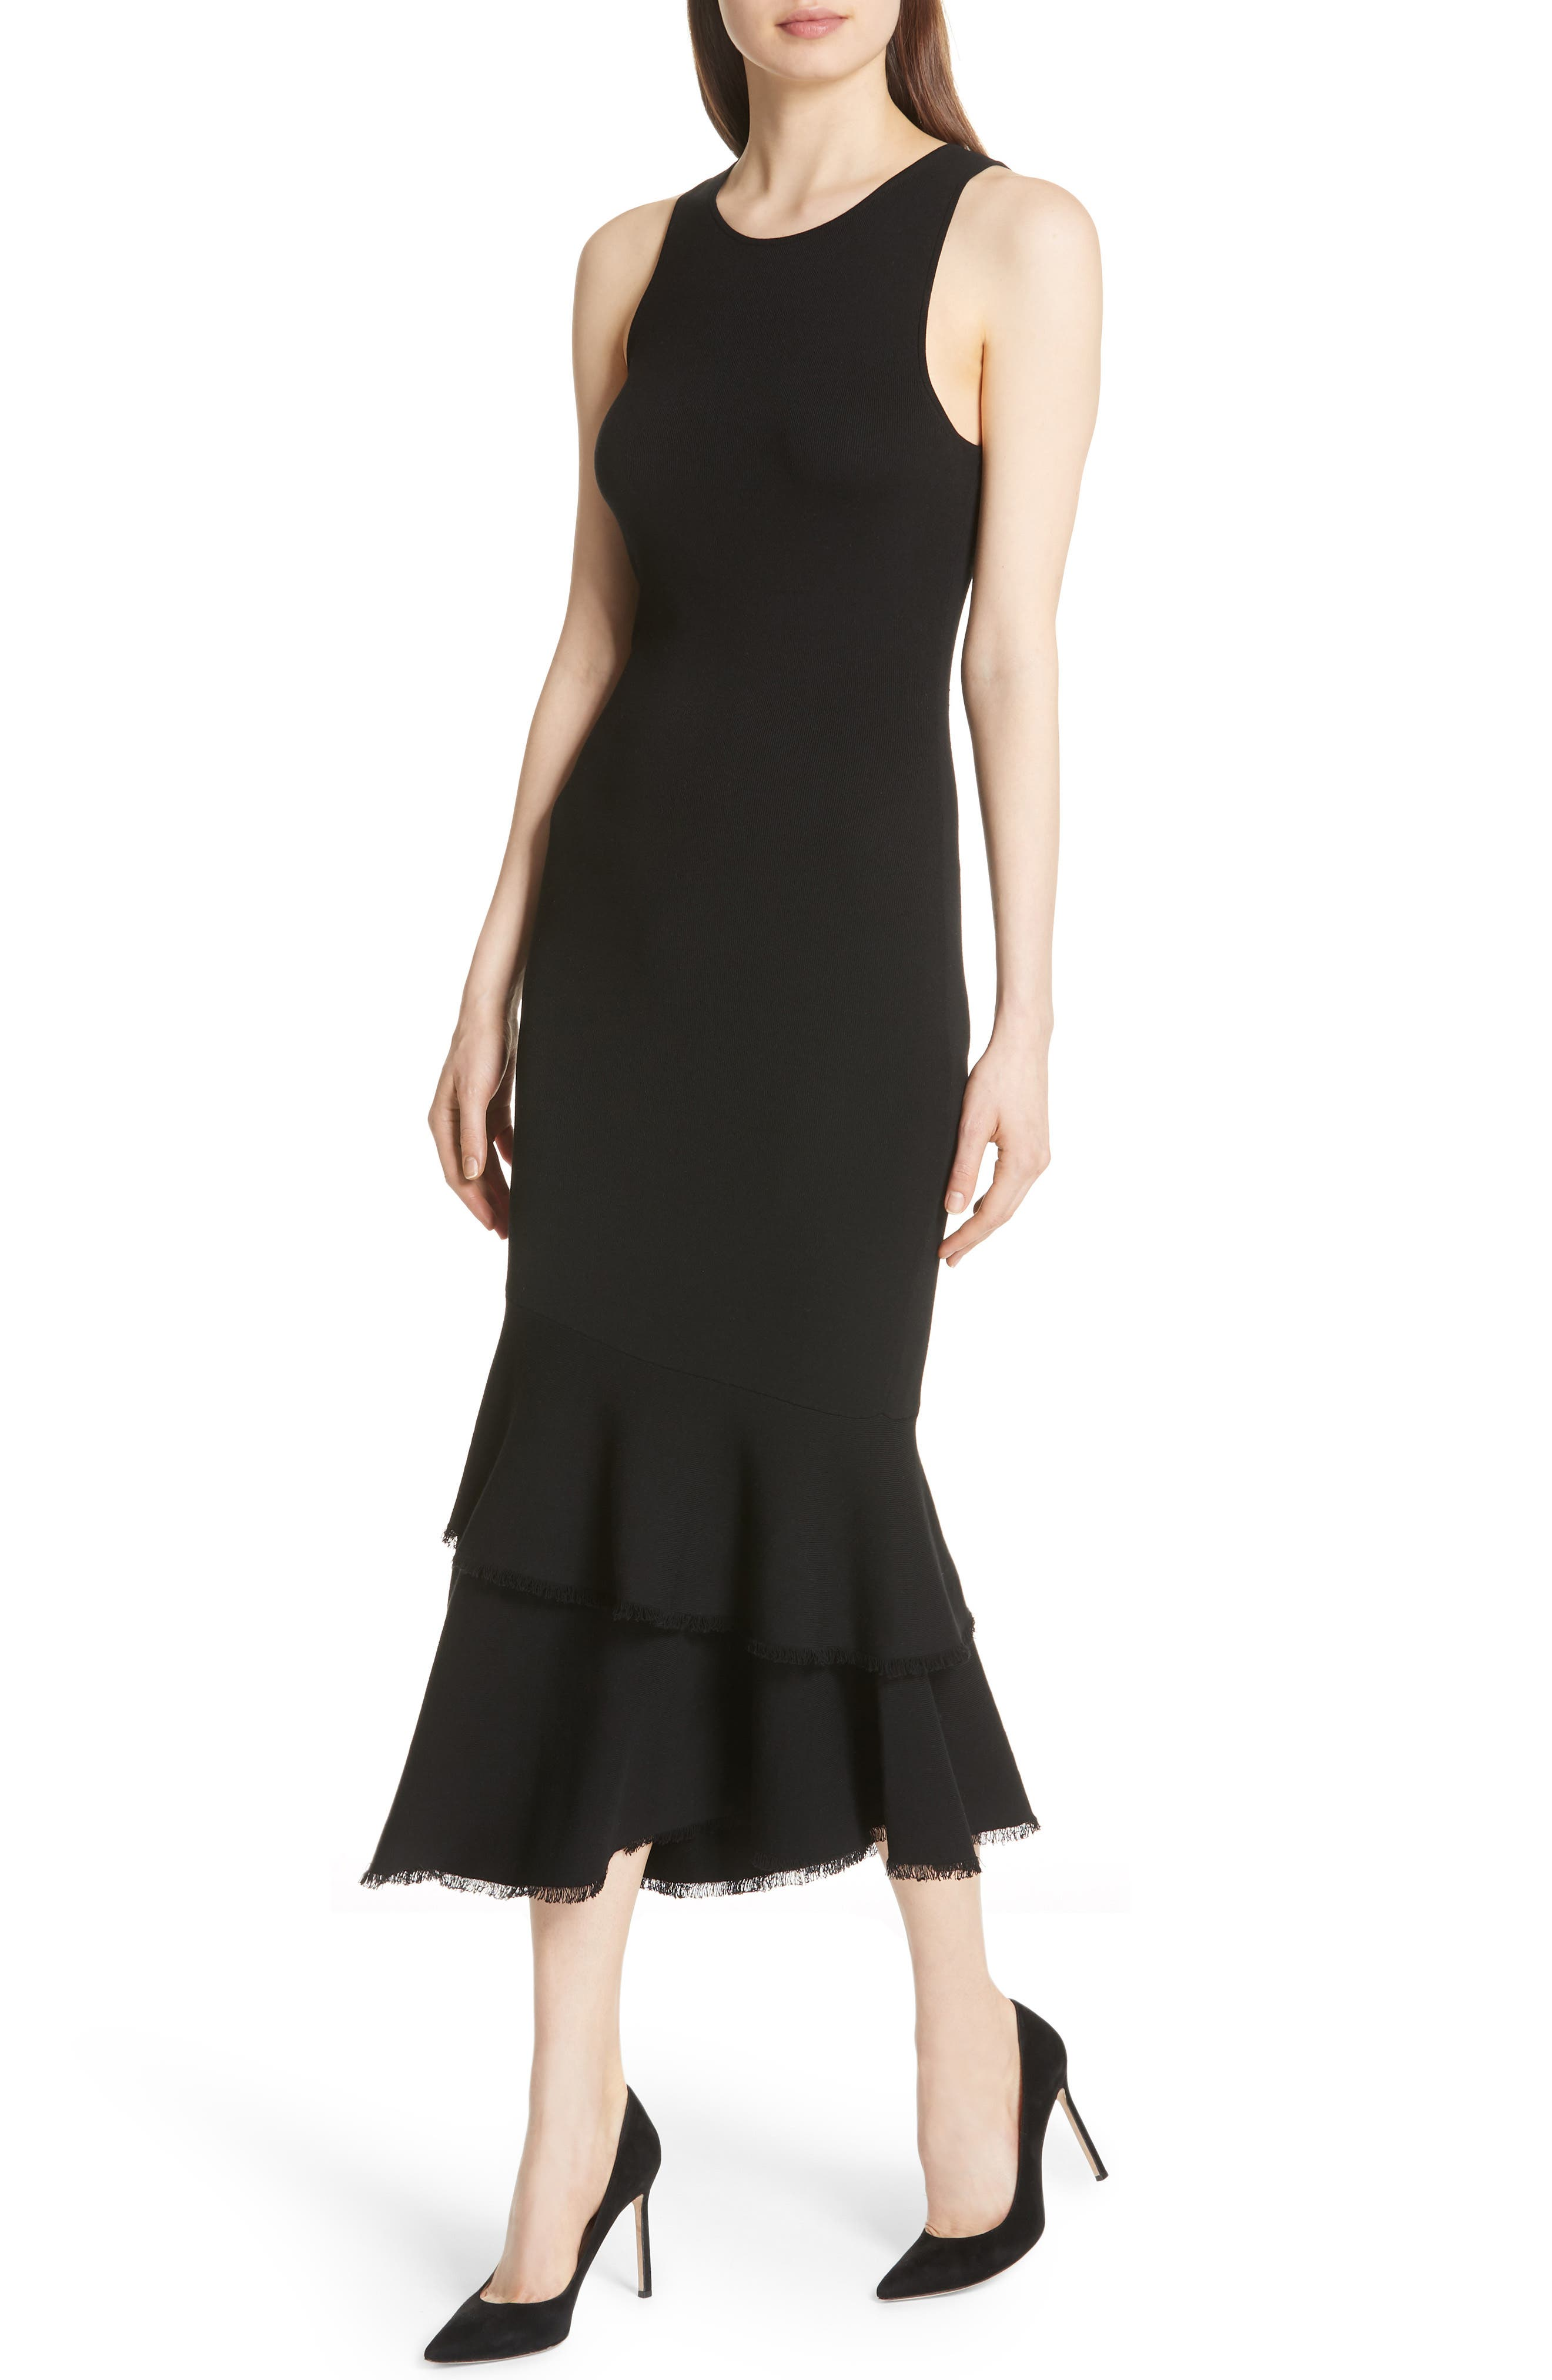 Nilimary Prosecco Midi Dress,                             Alternate thumbnail 4, color,                             Black